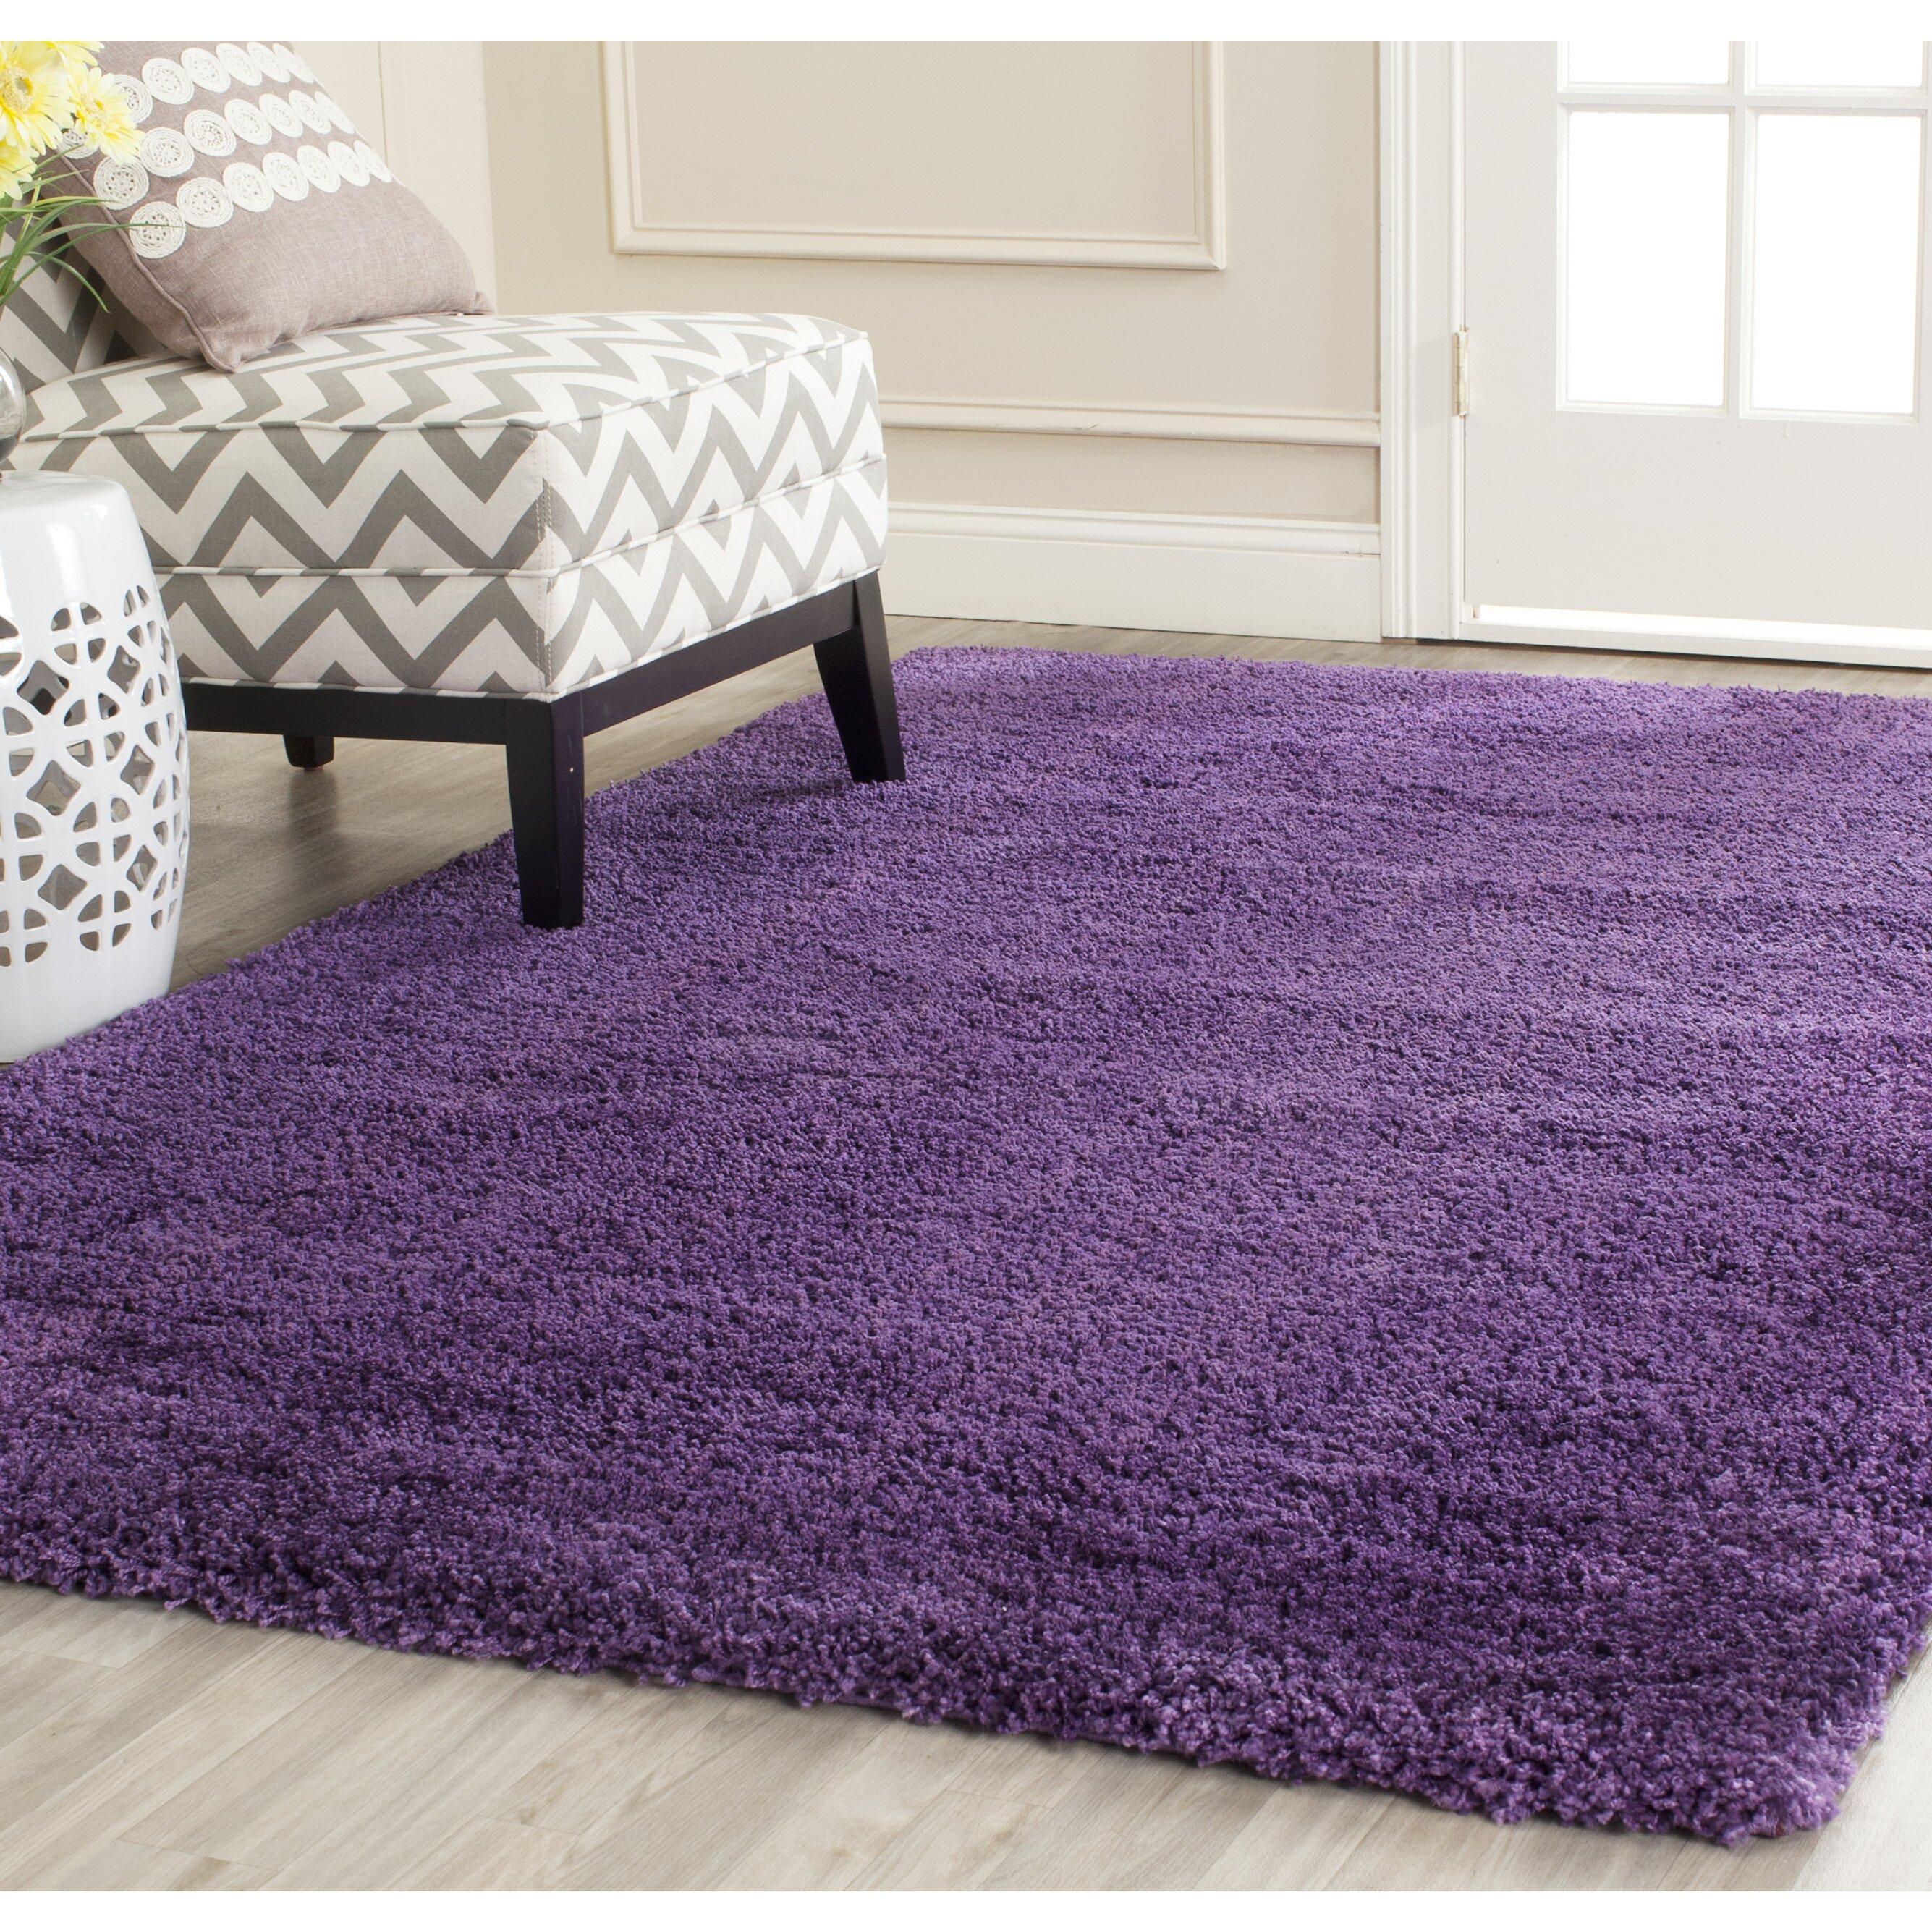 Purple And Lavender Rug: Zipcode™ Design Douglasville Purple Area Rug & Reviews